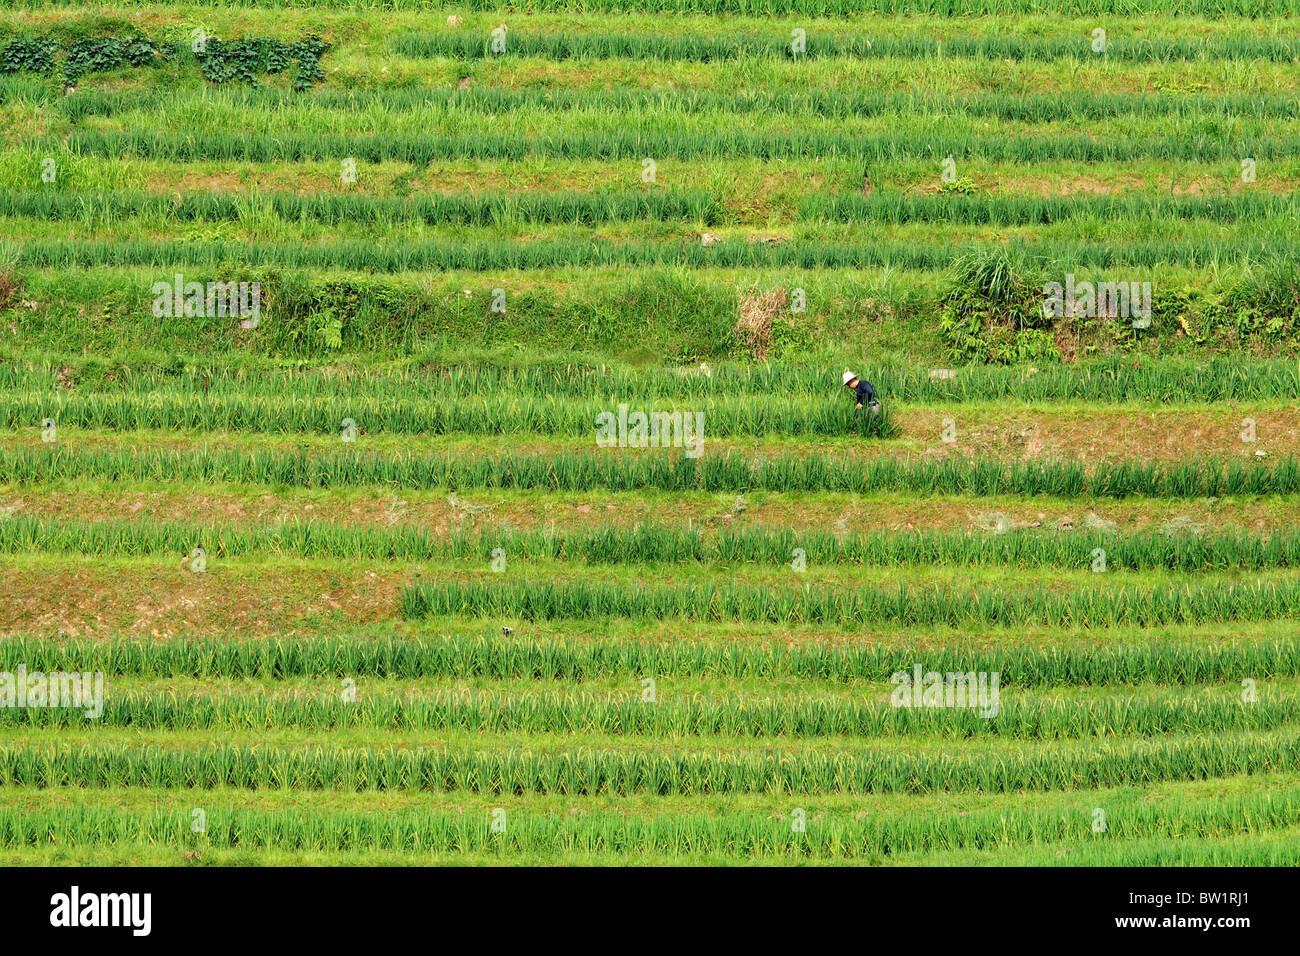 China - Dragon's Backbone Rice Terraces - Stock Image